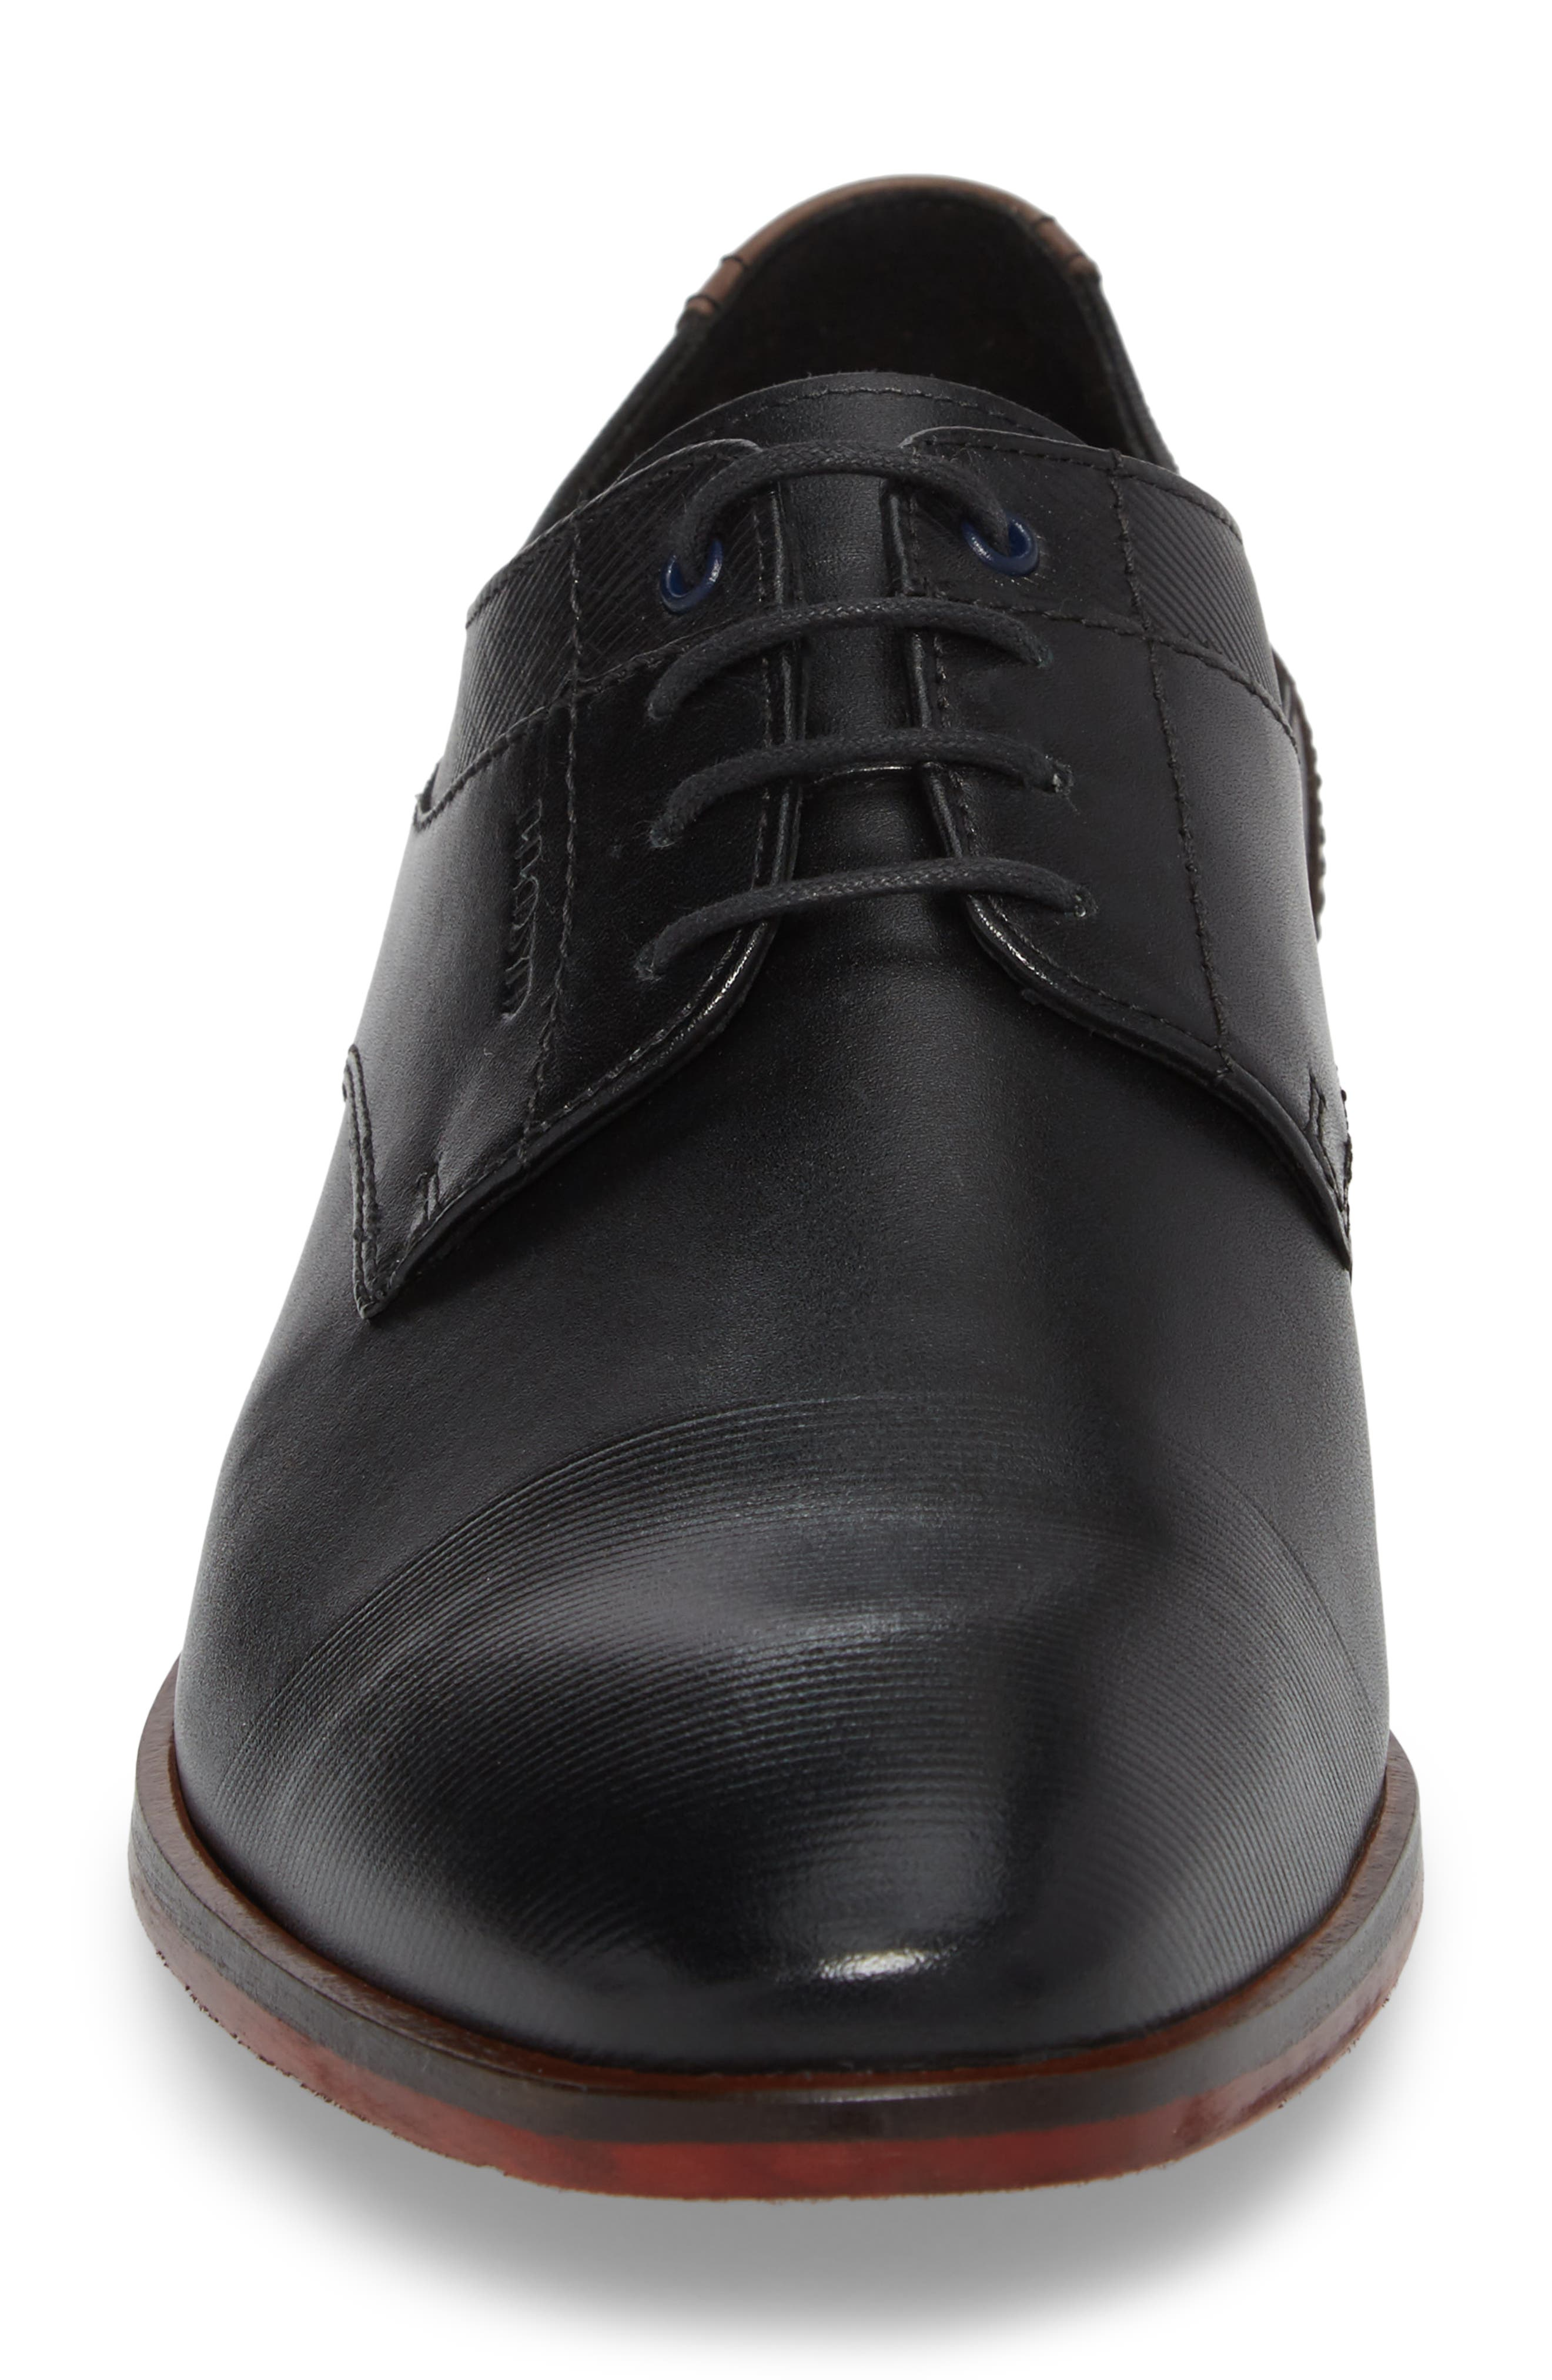 Henley Embossed Cap Toe Derby,                             Alternate thumbnail 4, color,                             Black/ Blue Leather